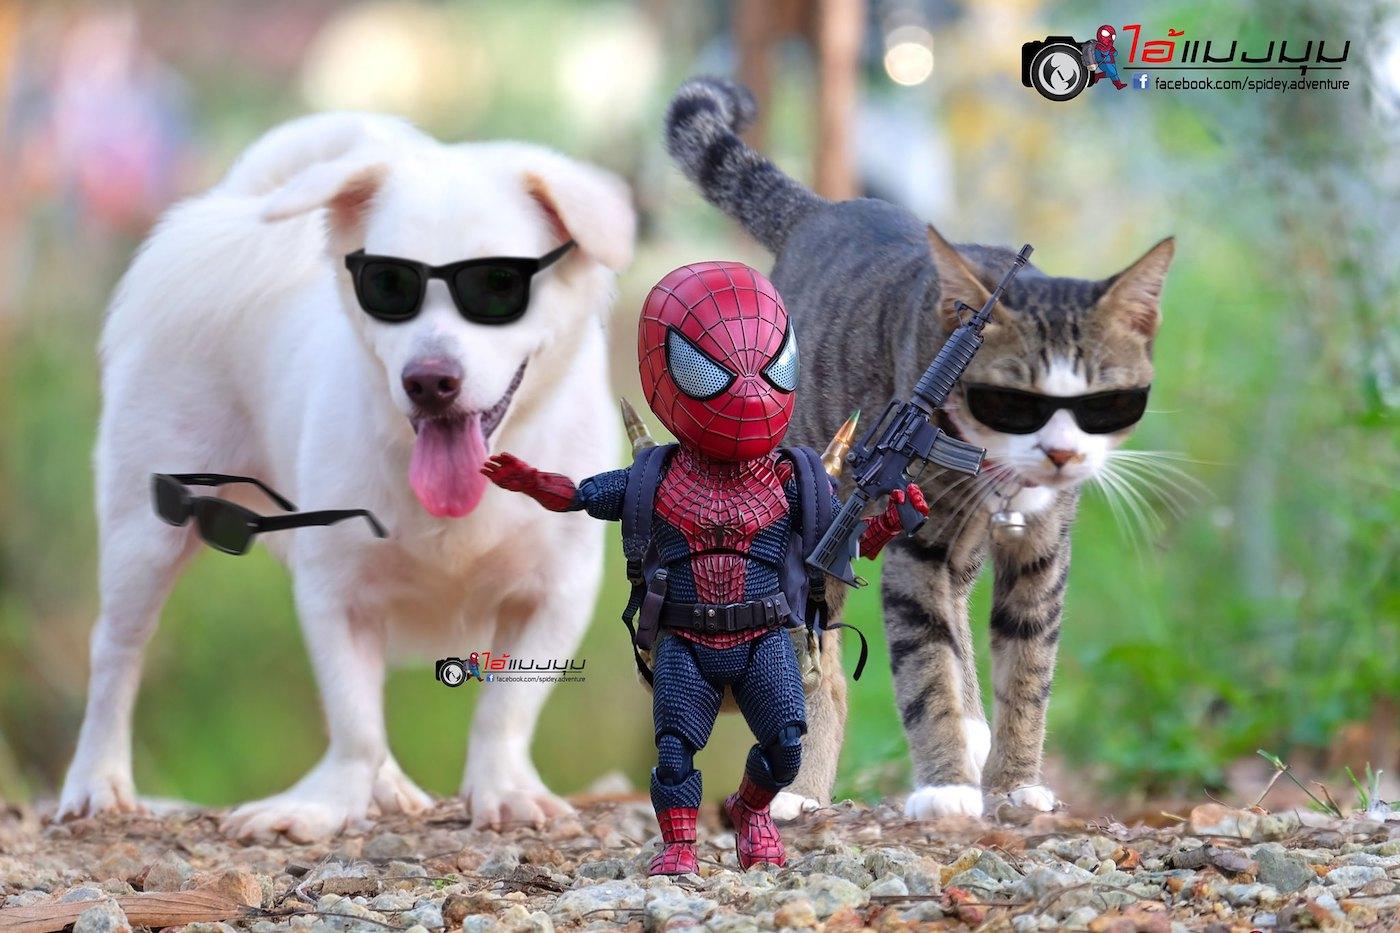 https://i0.wp.com/creapills.com/wp-content/uploads/2019/11/figurine-spiderman-chat-10.jpg?w=1400&ssl=1